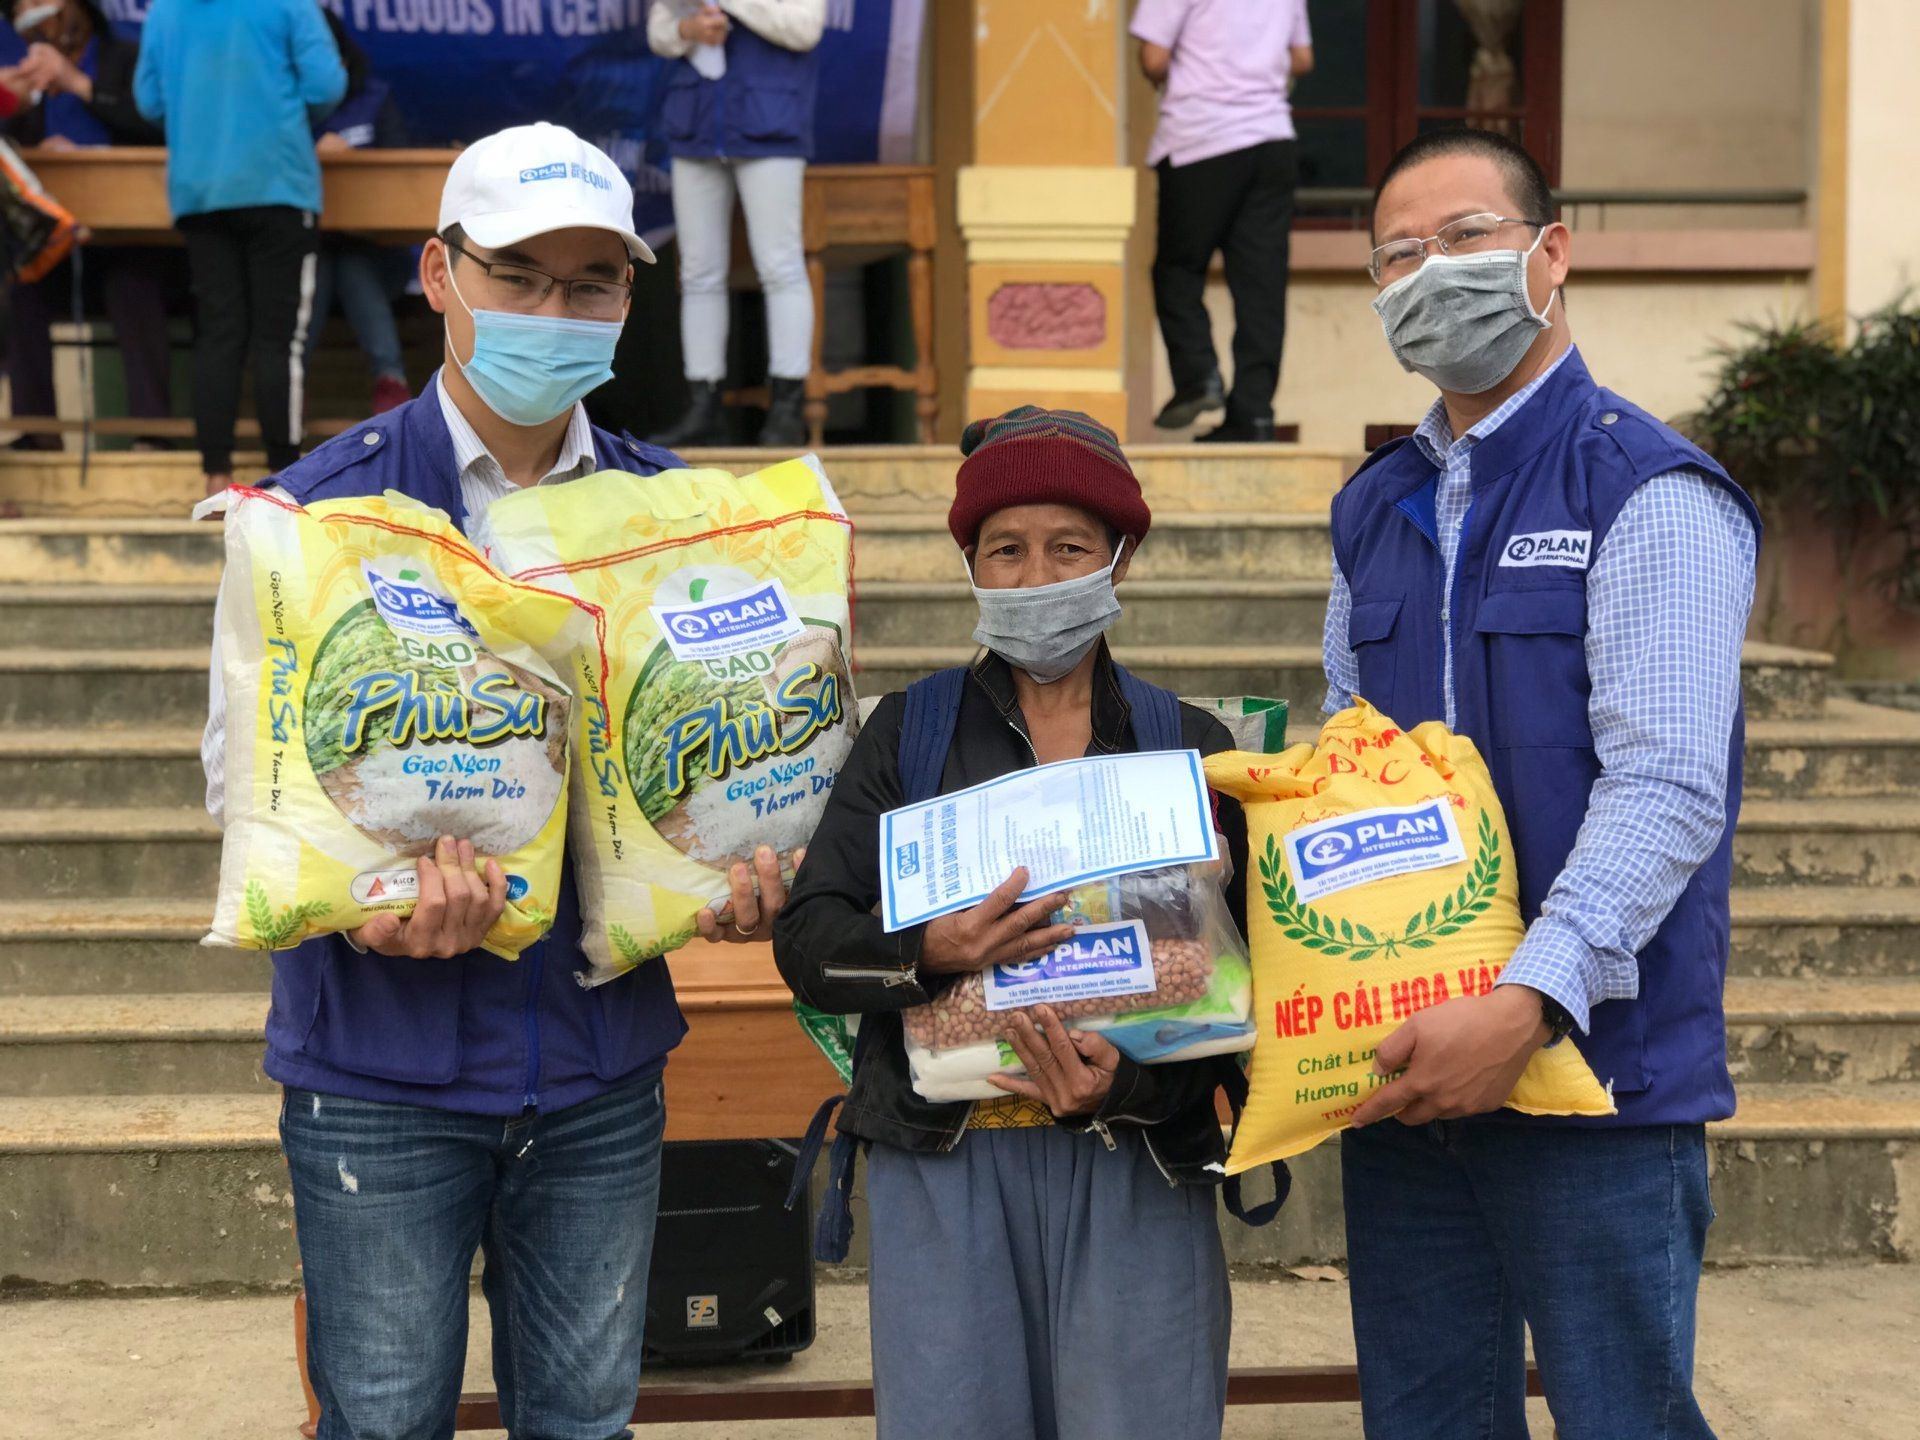 Warm tet festival amidst covid 19: aid sent to help quang binh's locals